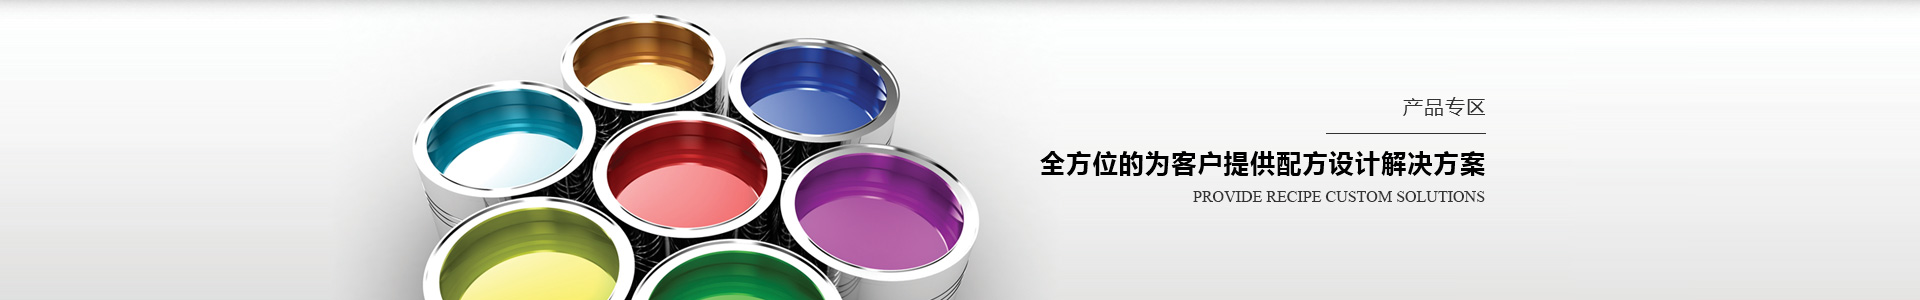 EPON™ / EPIKOTE™ Low Viscosity Liquid Epoxy Resins